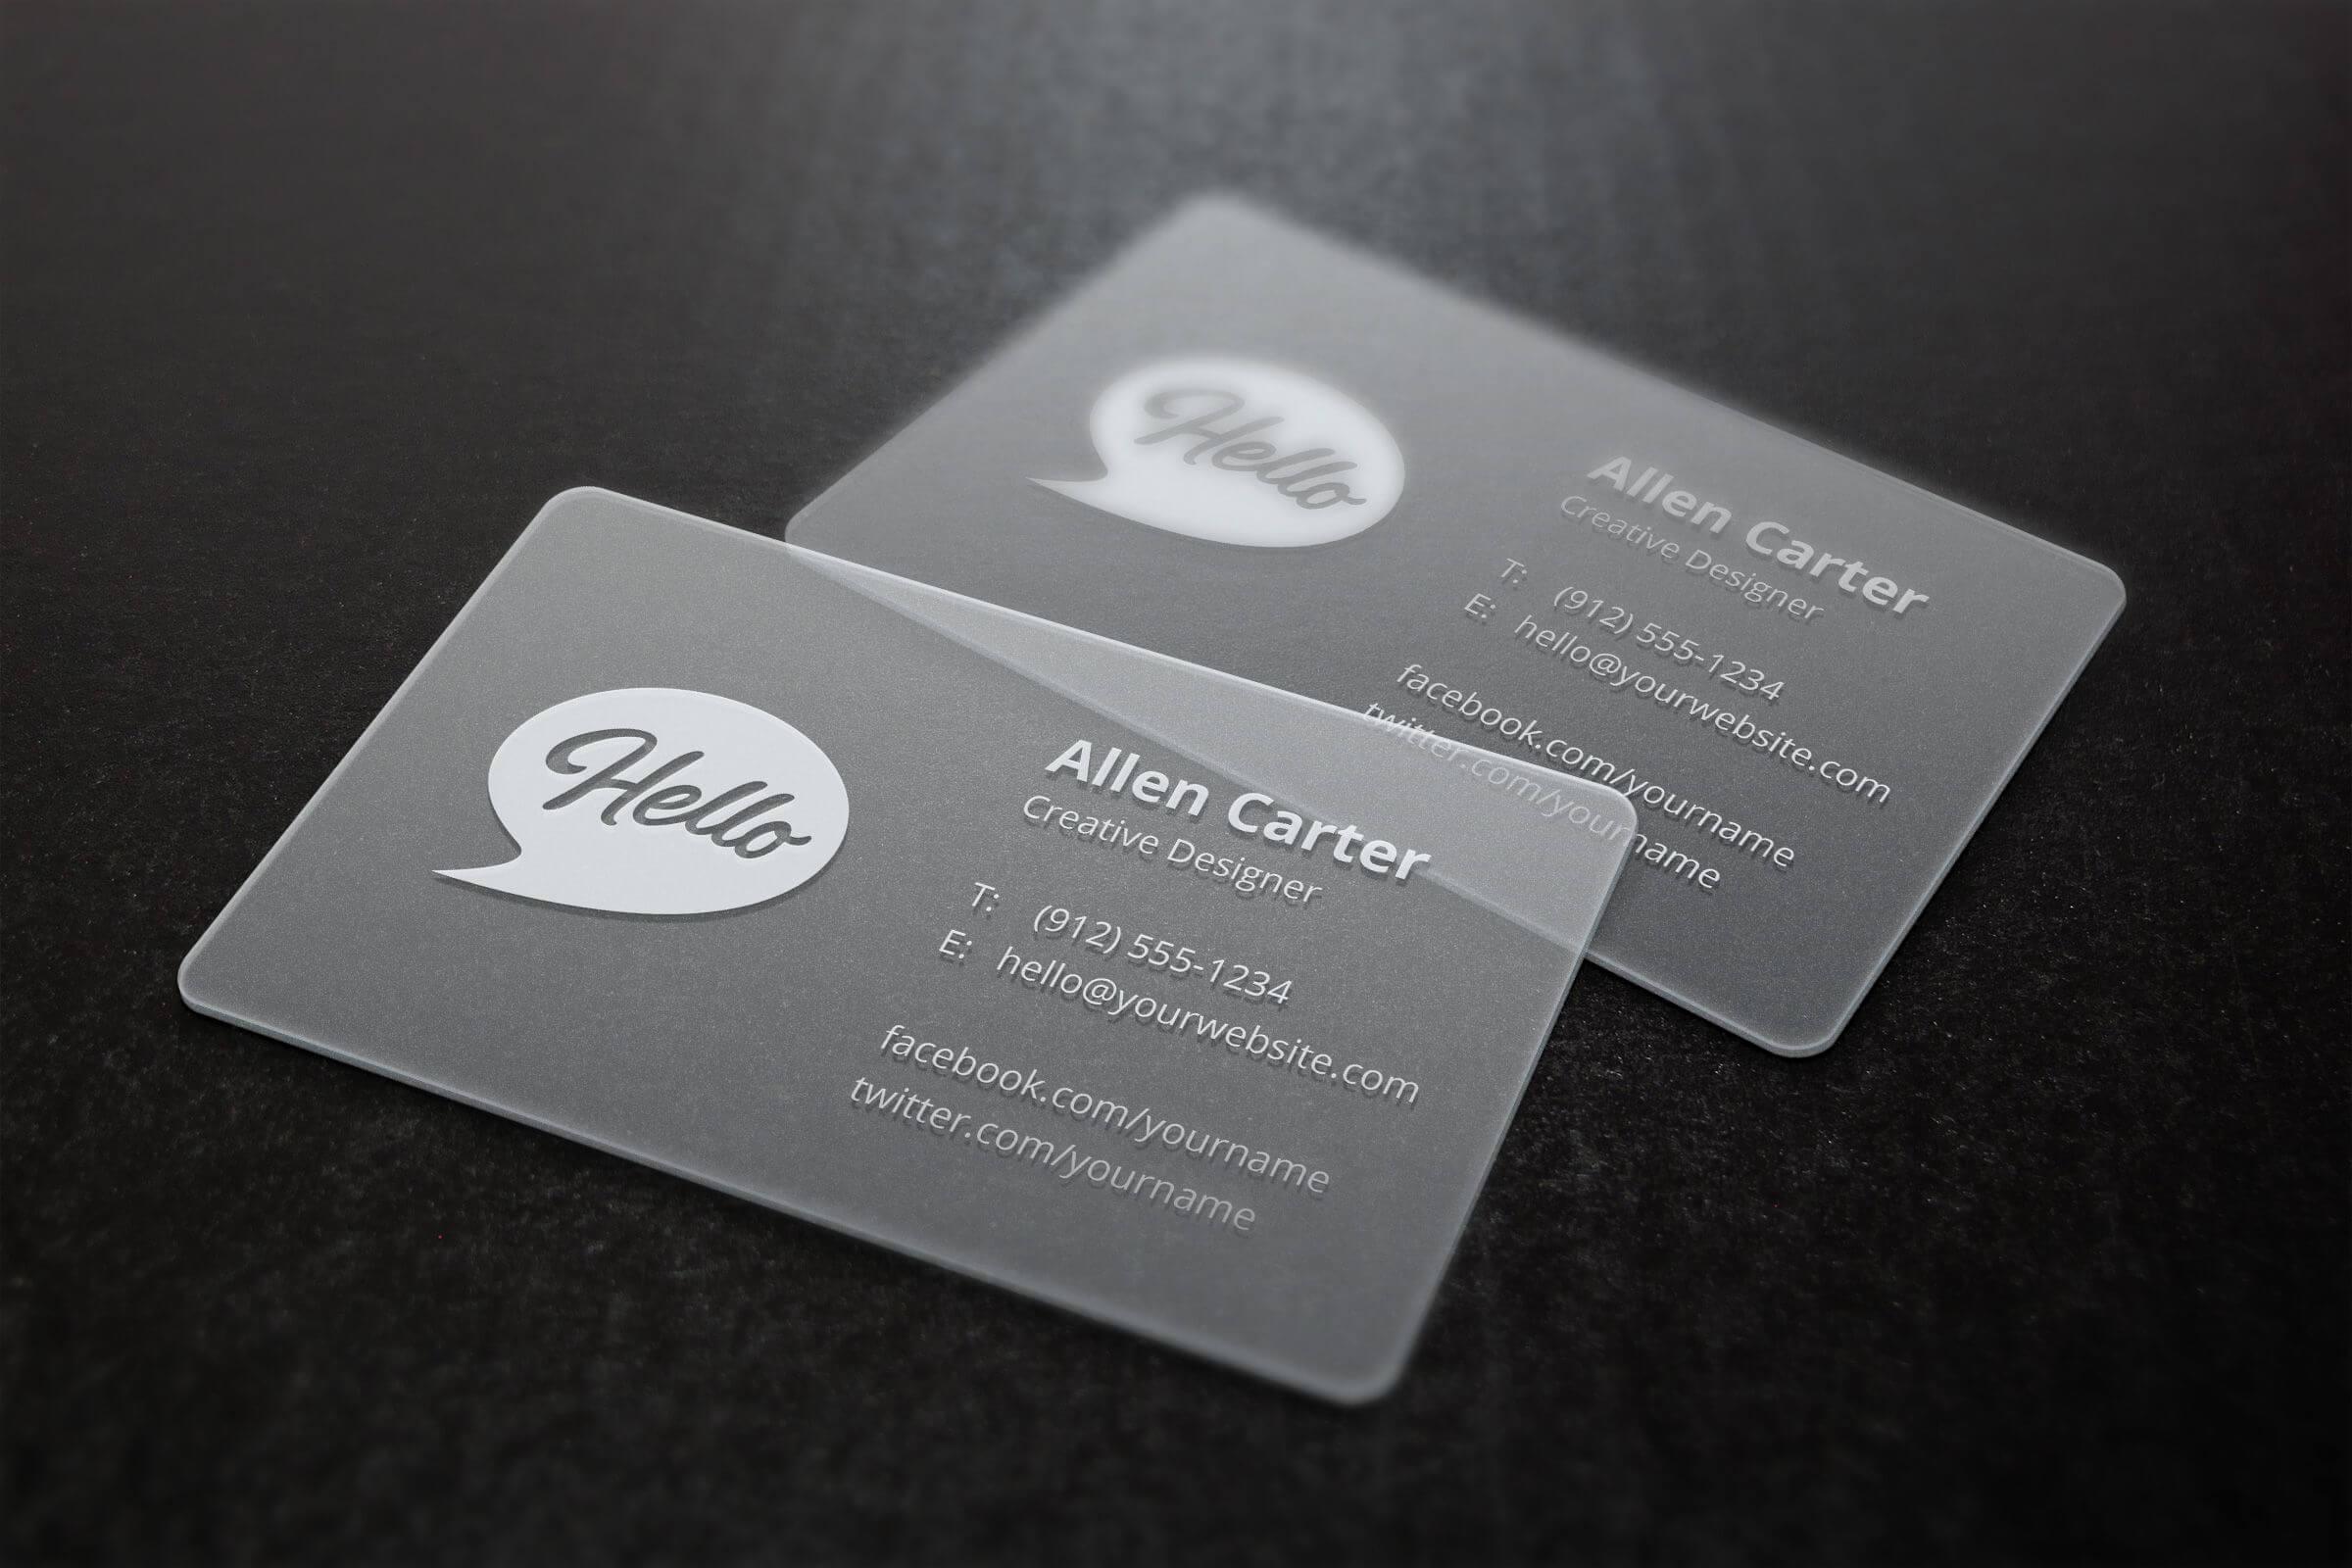 Translucent Business Cards Mockup | Business Card Mock Up With Transparent Business Cards Template